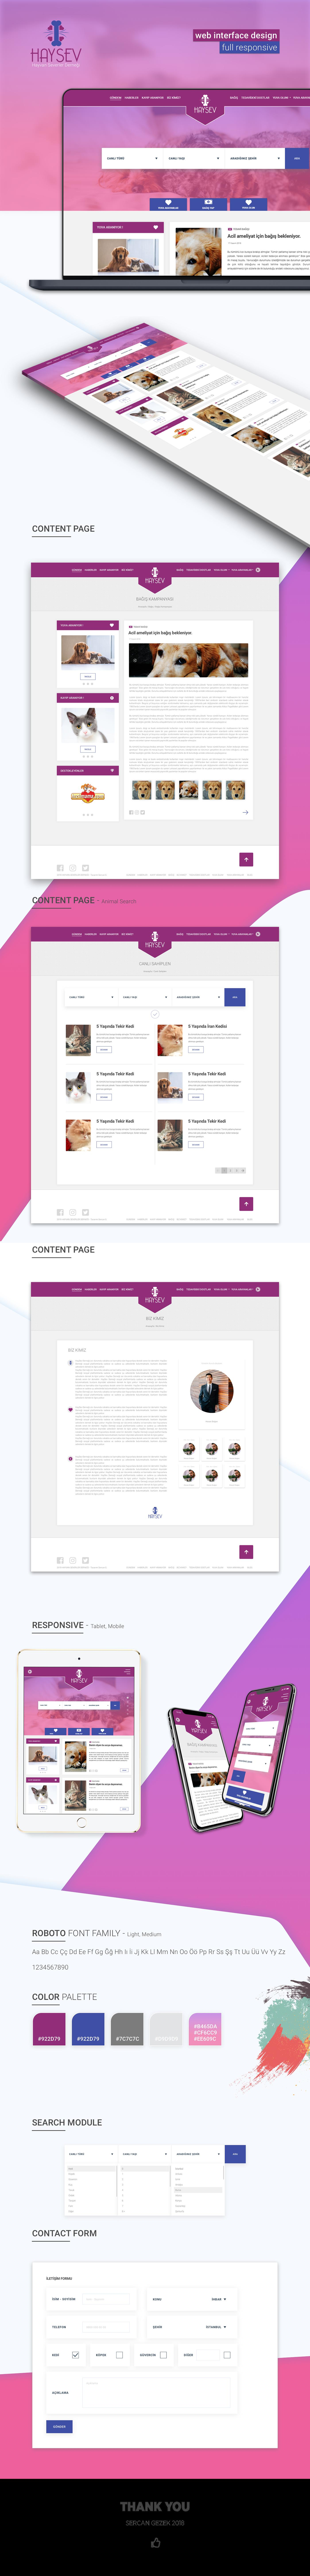 haysev Haysev Web haysev interface Web Design  interface design Responsive